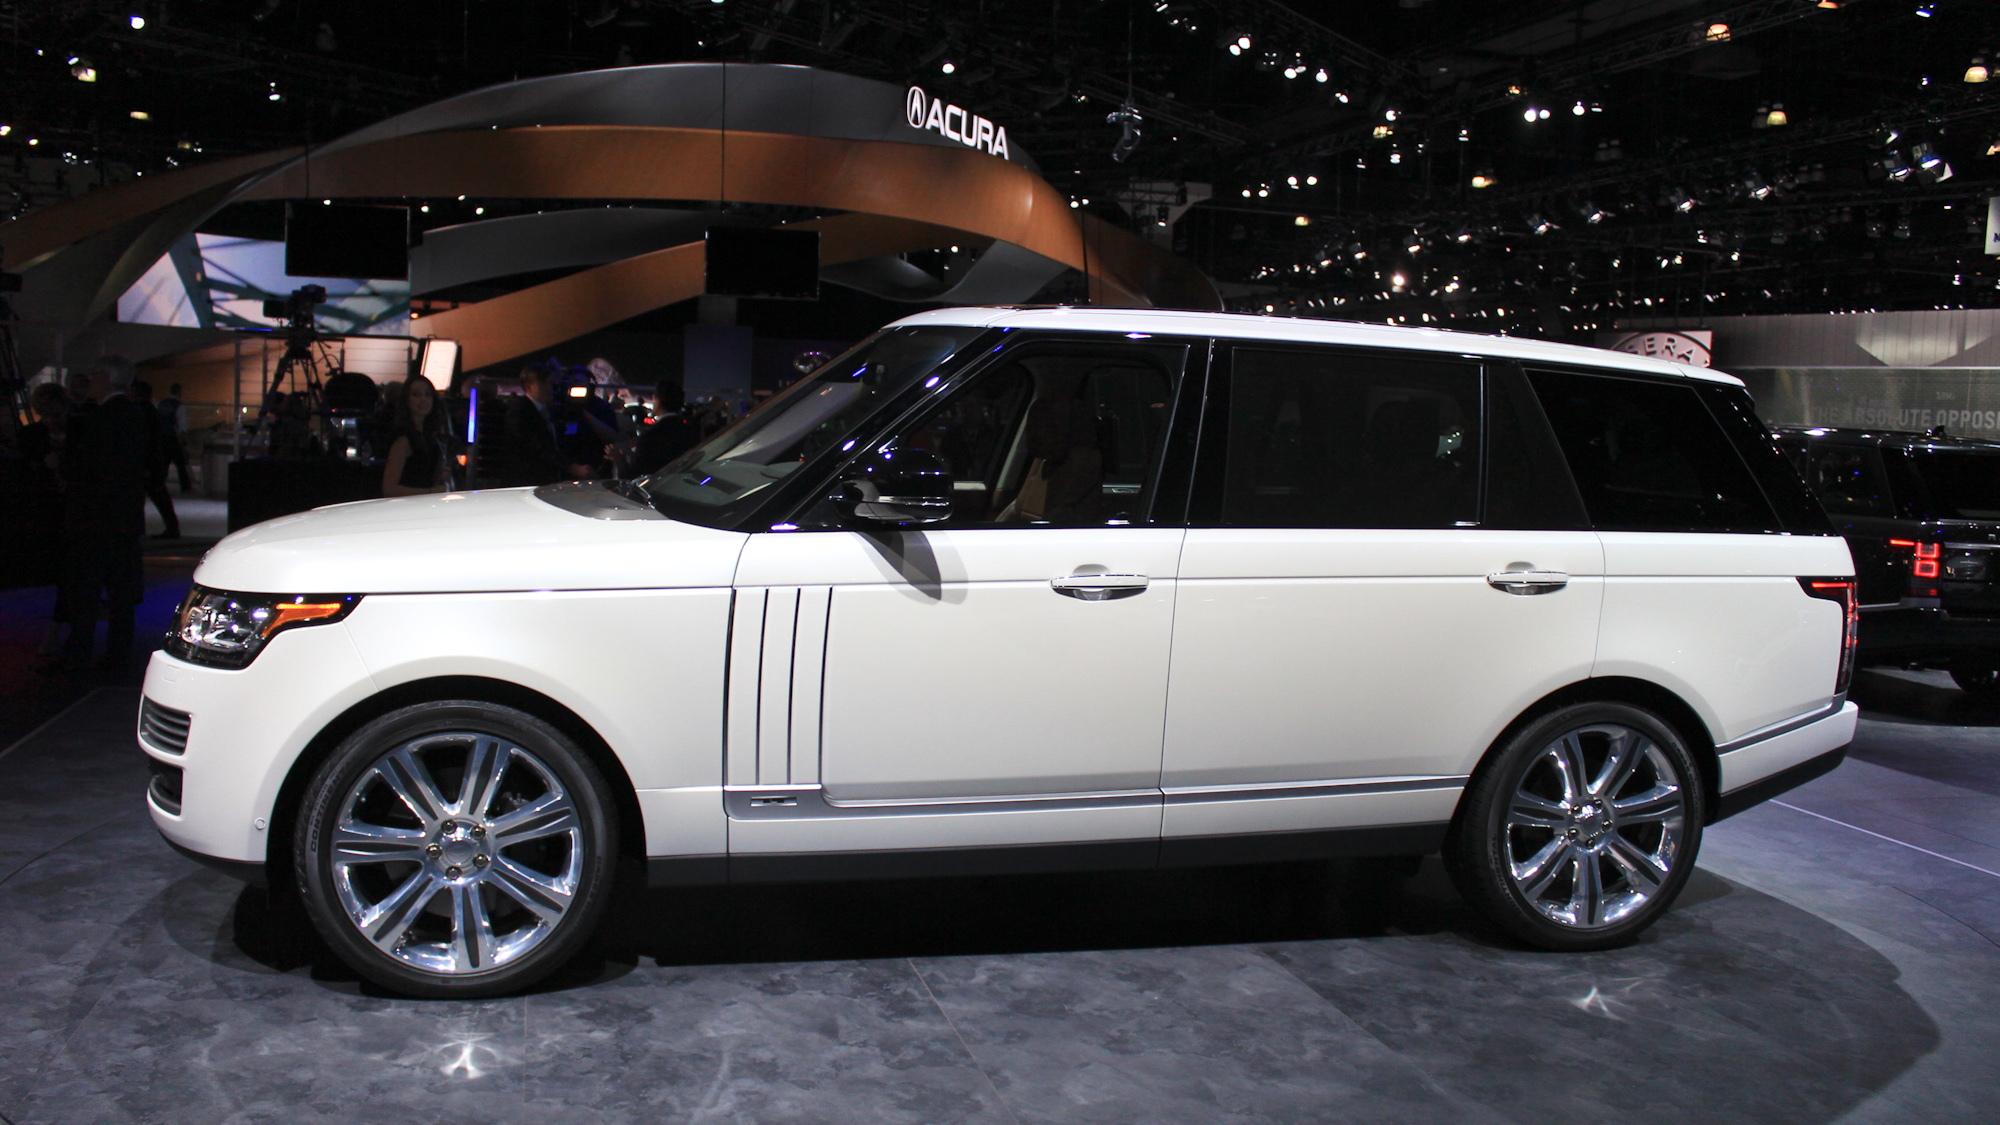 2014 Land Rover Range Rover Long-Wheelbase Autobiography Black, 2013 Los Angeles Auto Show